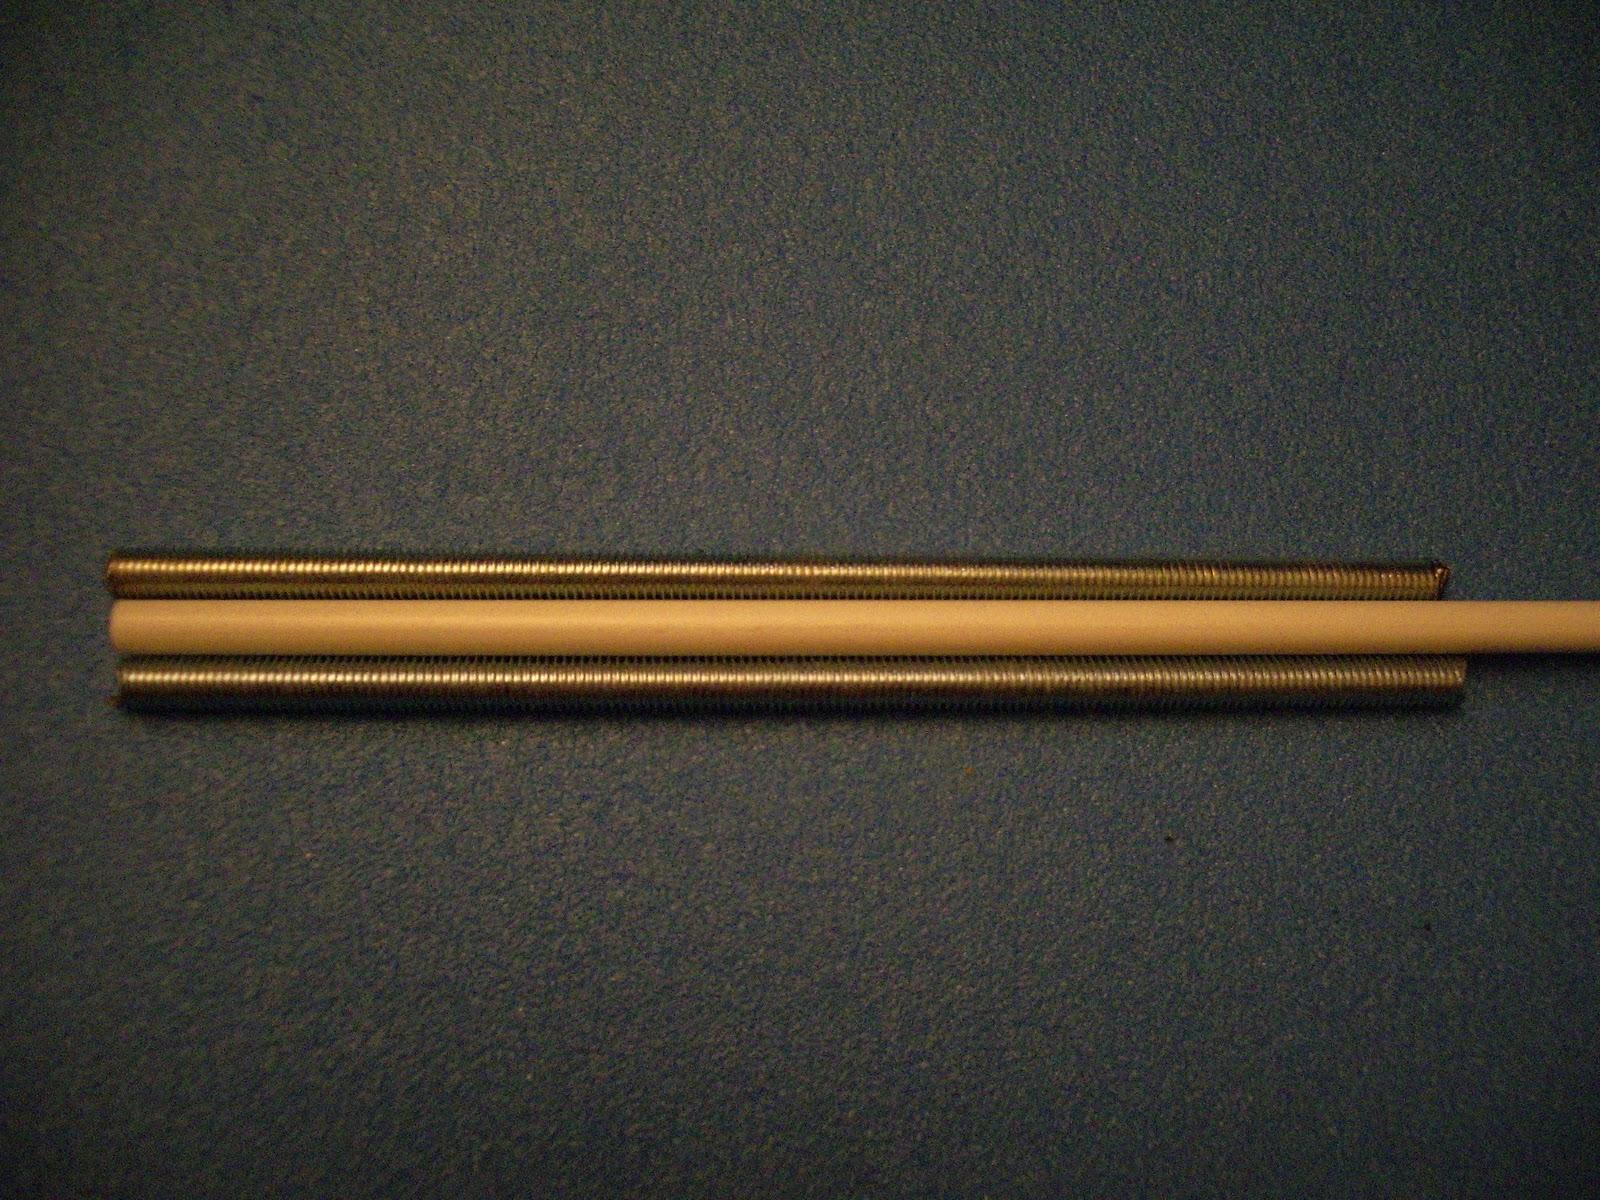 Las forjas de skilfngheim c mo fabricar espadas de - Varillas de fibra de vidrio ...